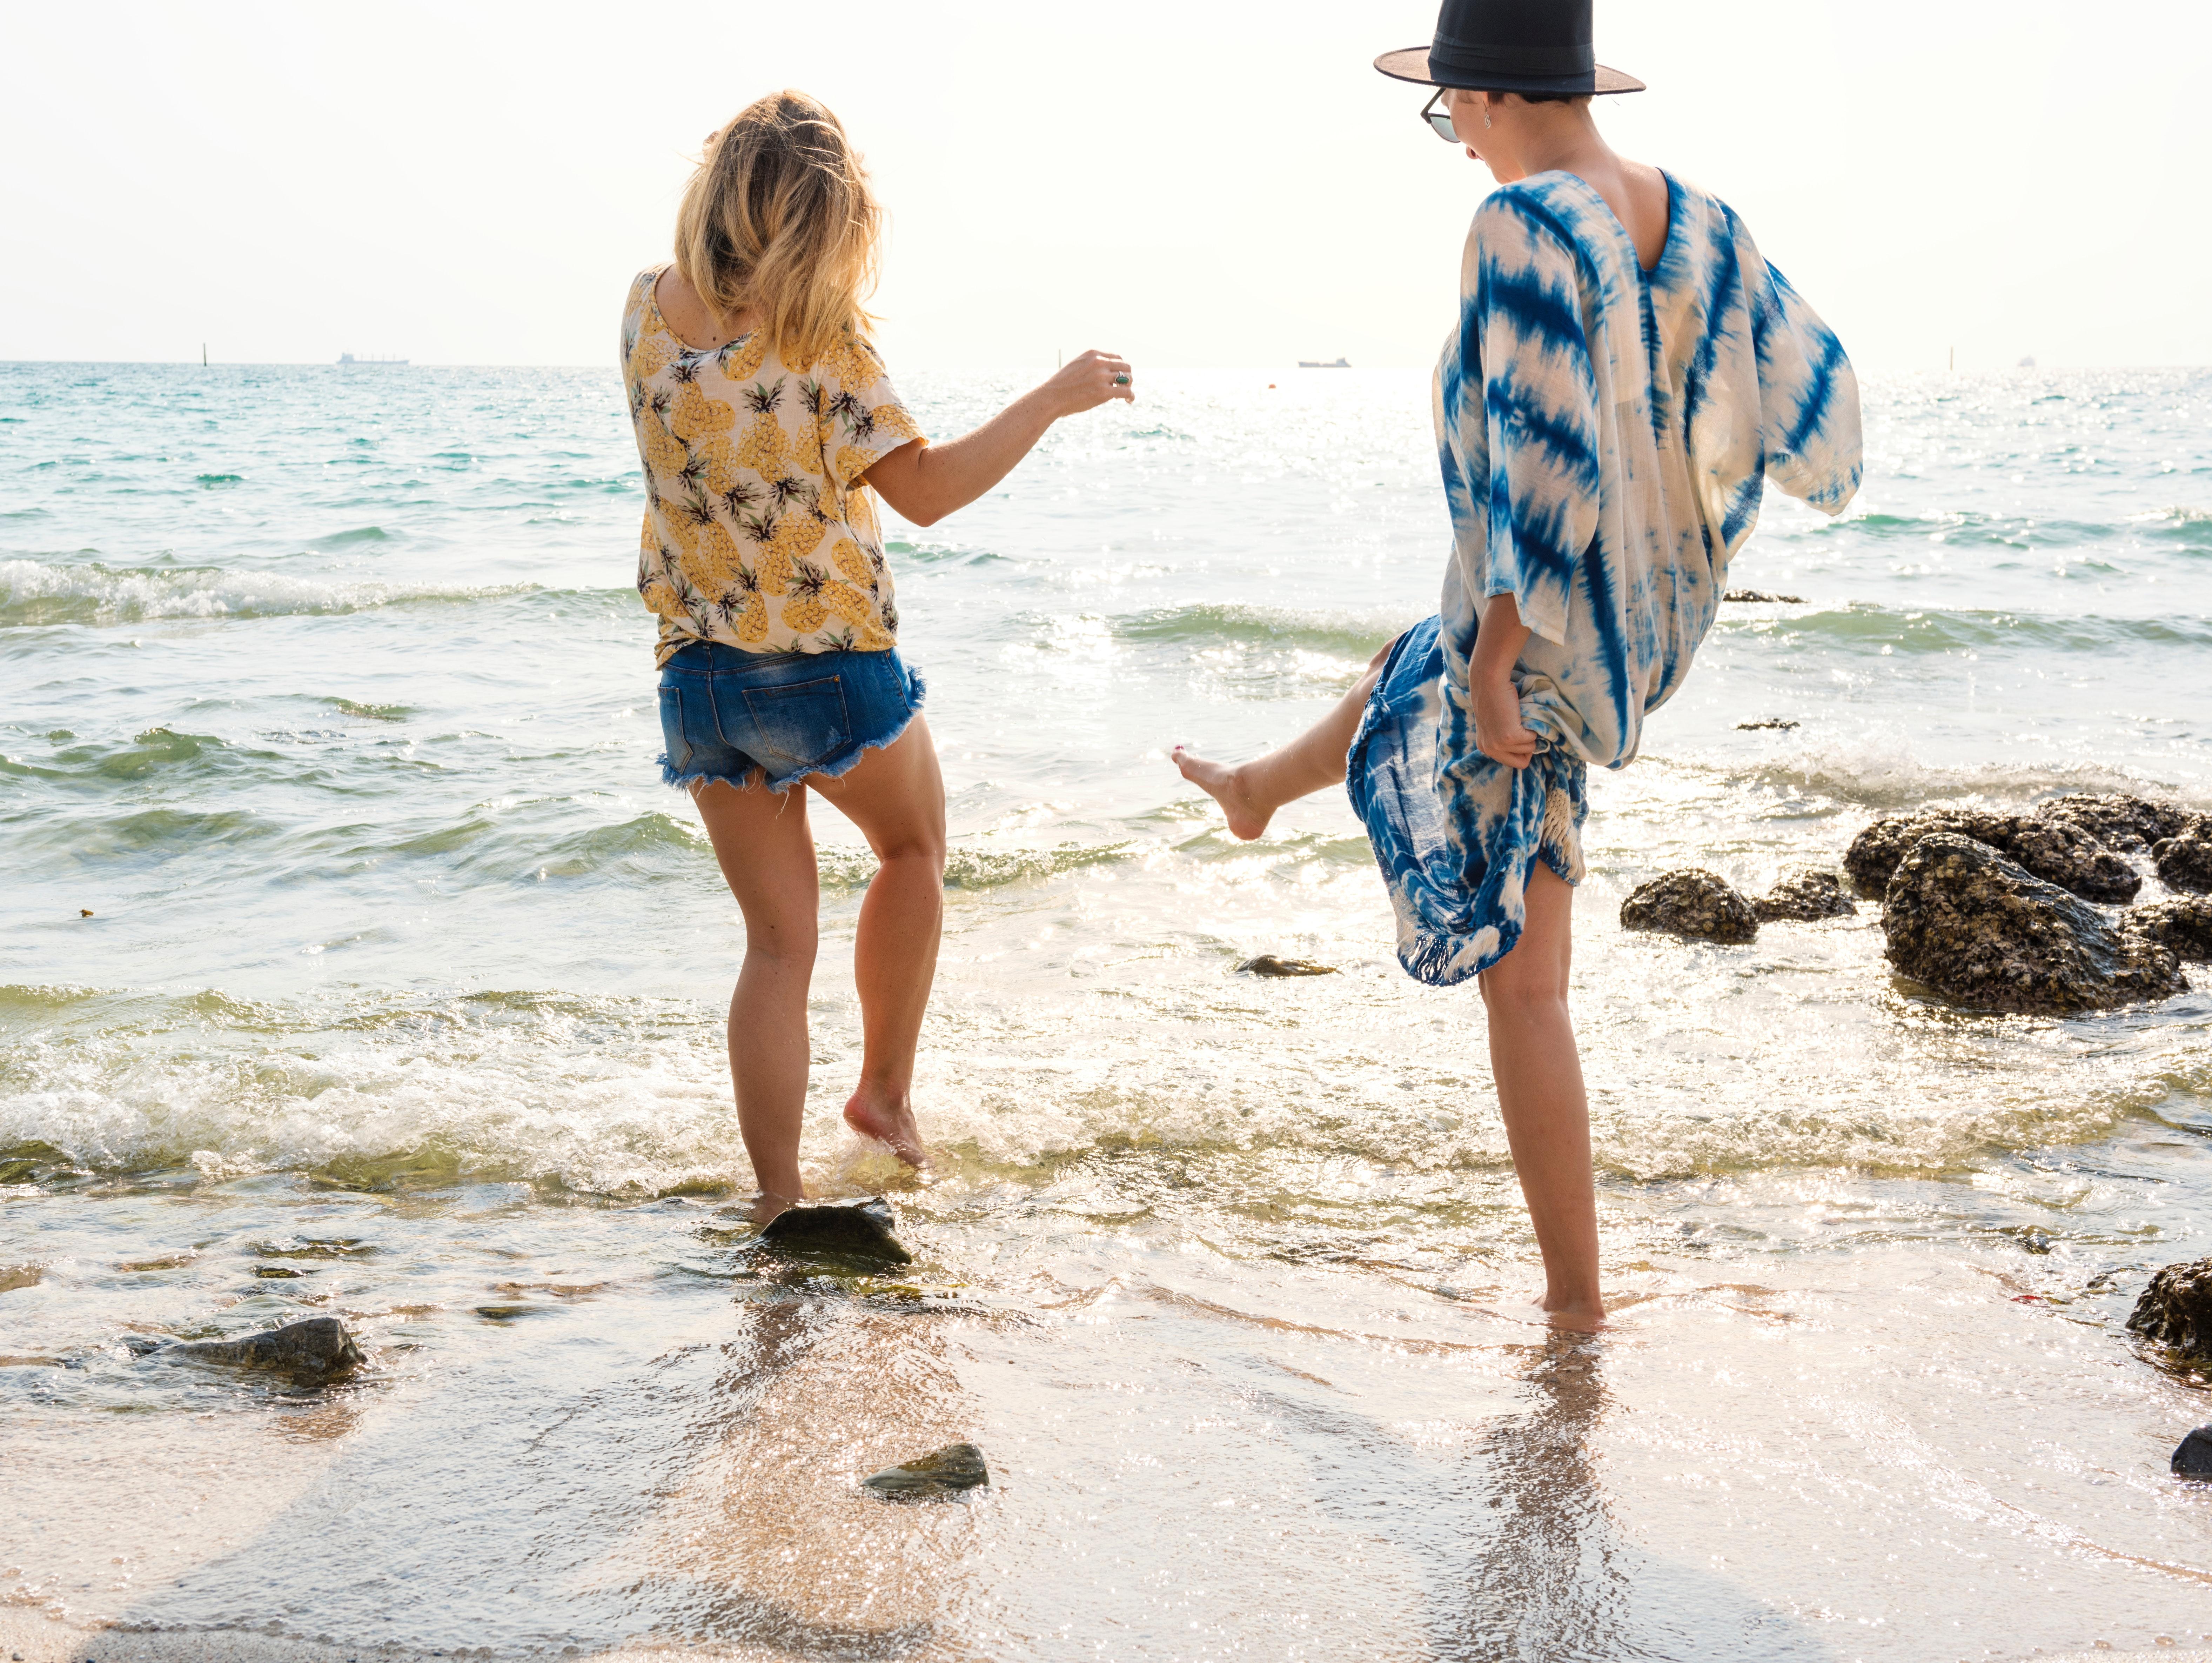 Women on Seashore, Adventure, Sun, Sea, Seashore, HQ Photo